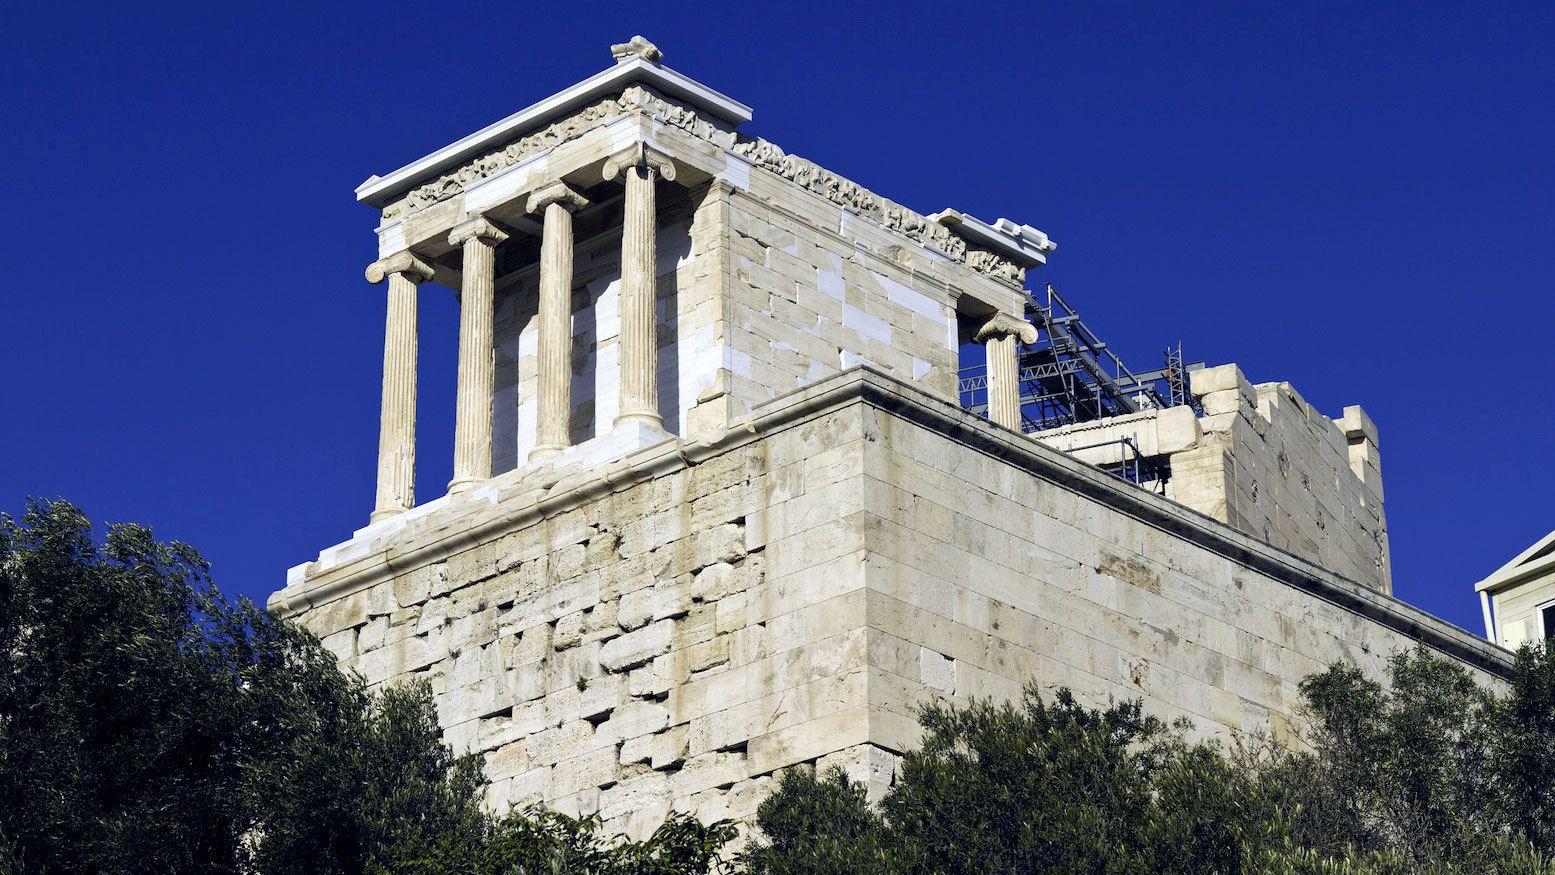 The Temple of Athena Nike on the Acropolis of Athens